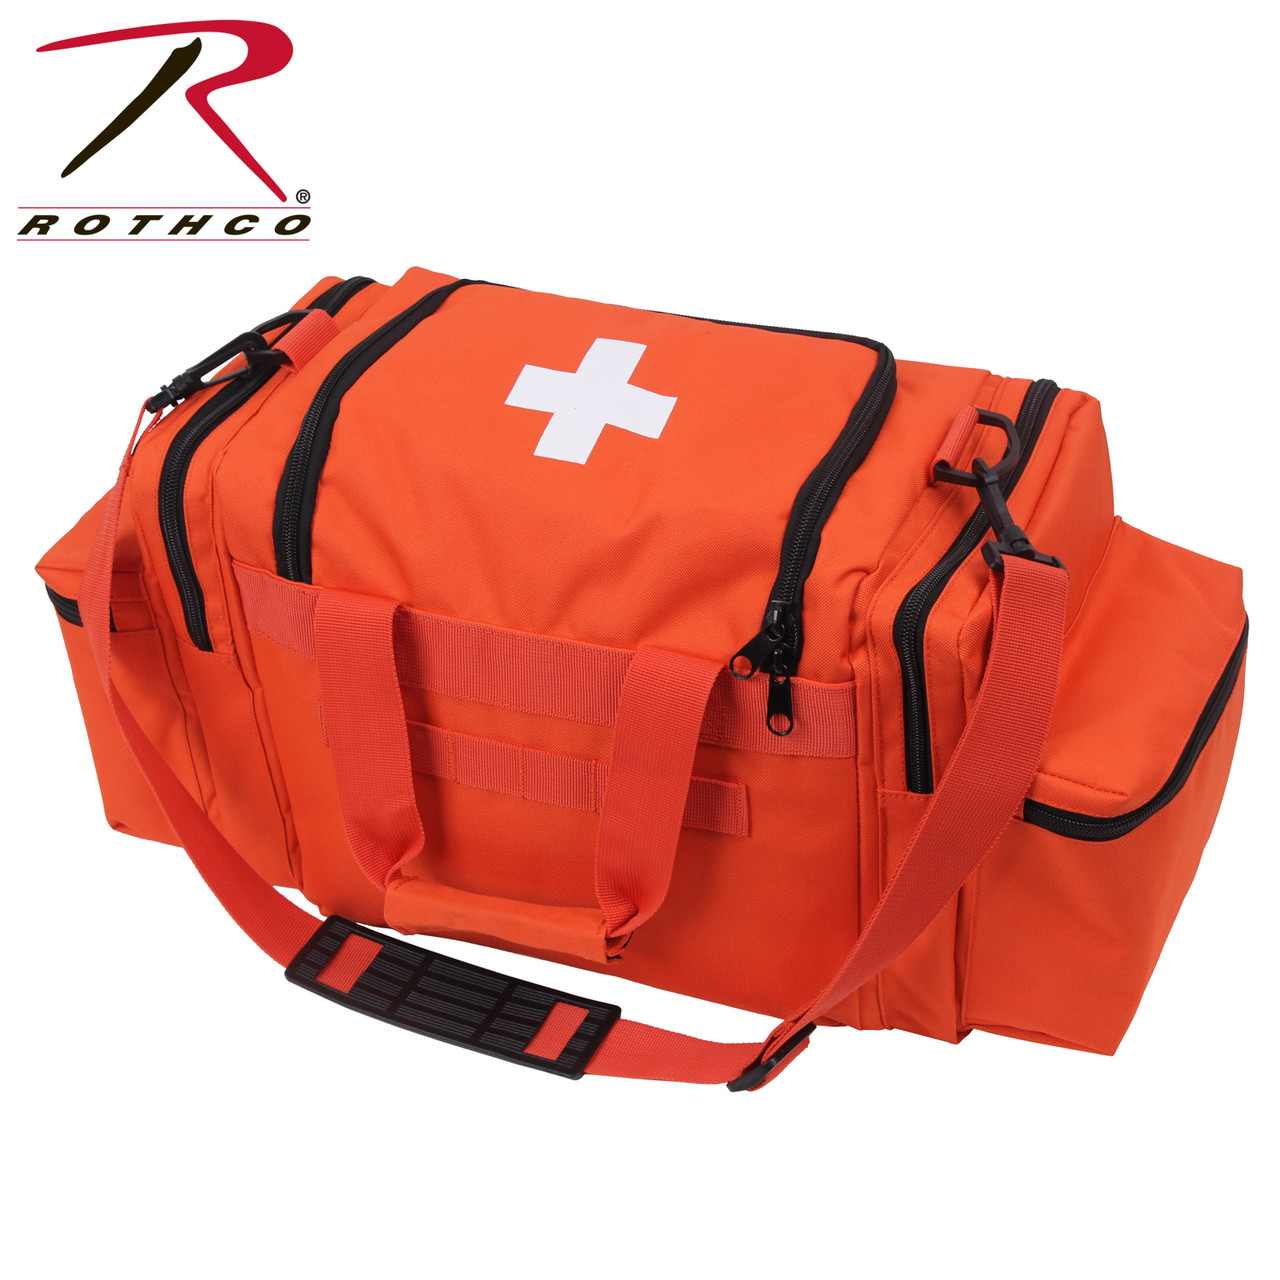 Rothco EMT Medical Trauma Kit Orange | Rothco 1145 Orange | EMT First Aid Kit